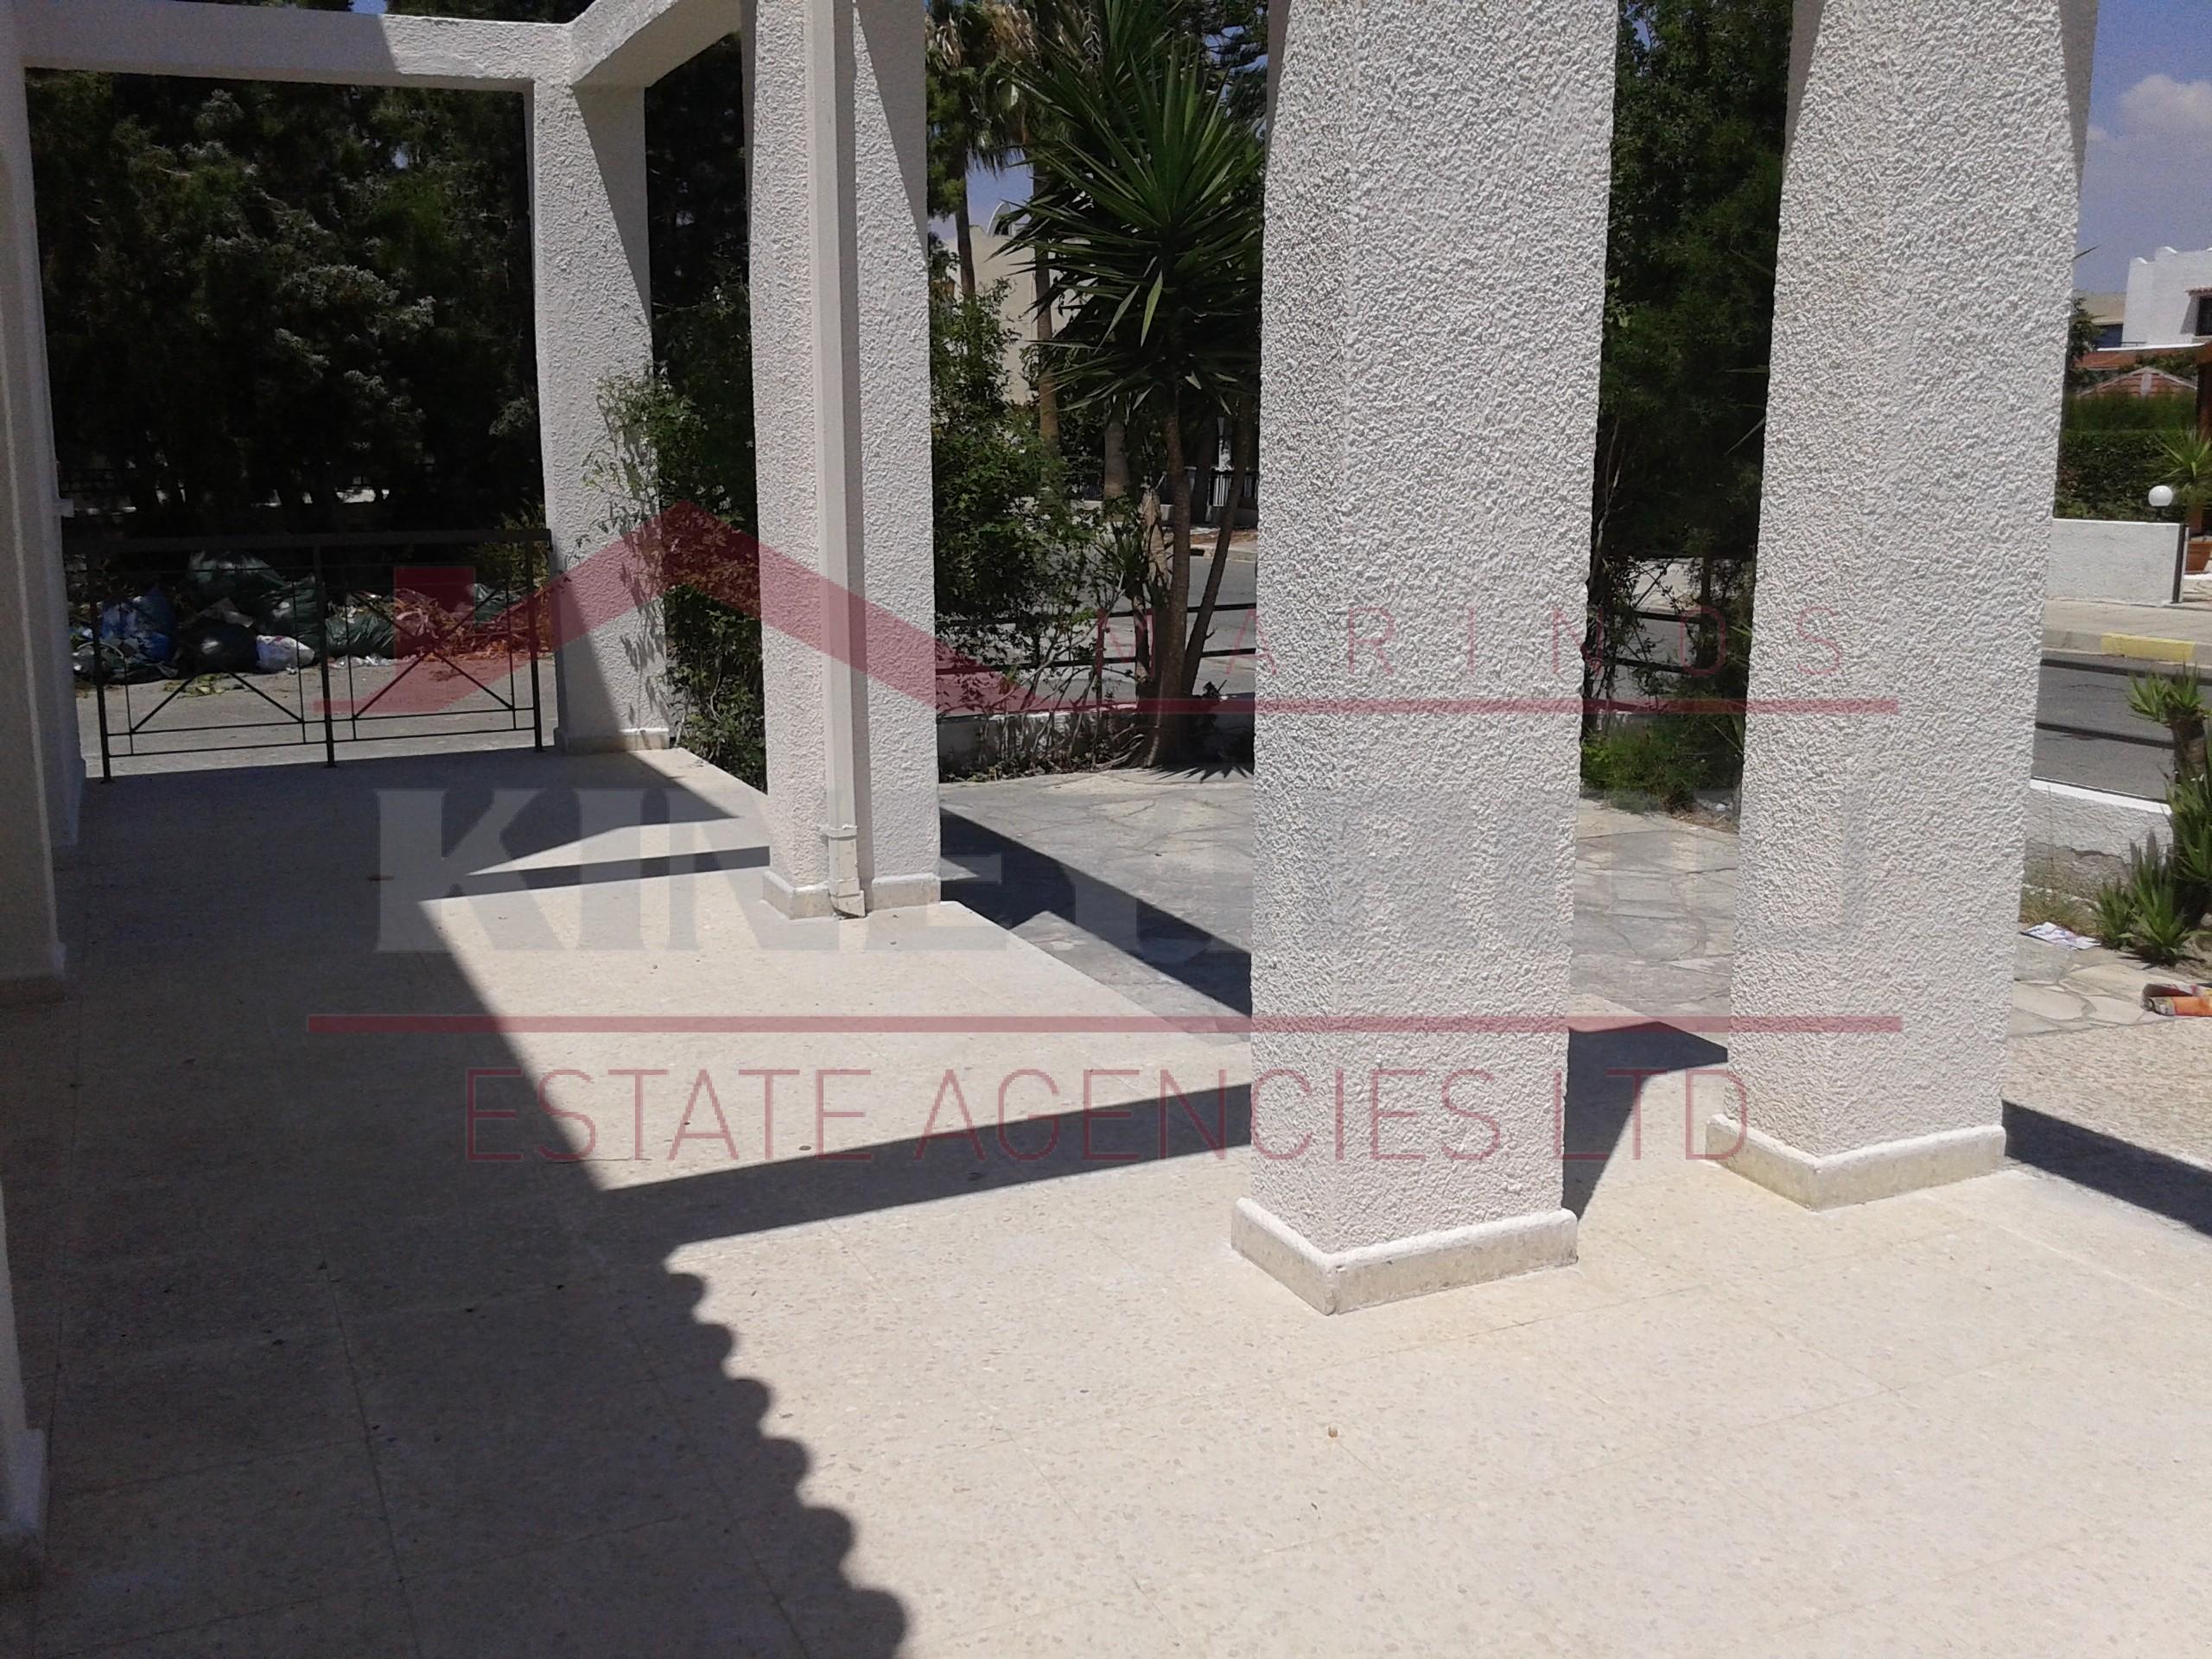 2 Bedroom house for sale in Dhekelia road – Larnaca